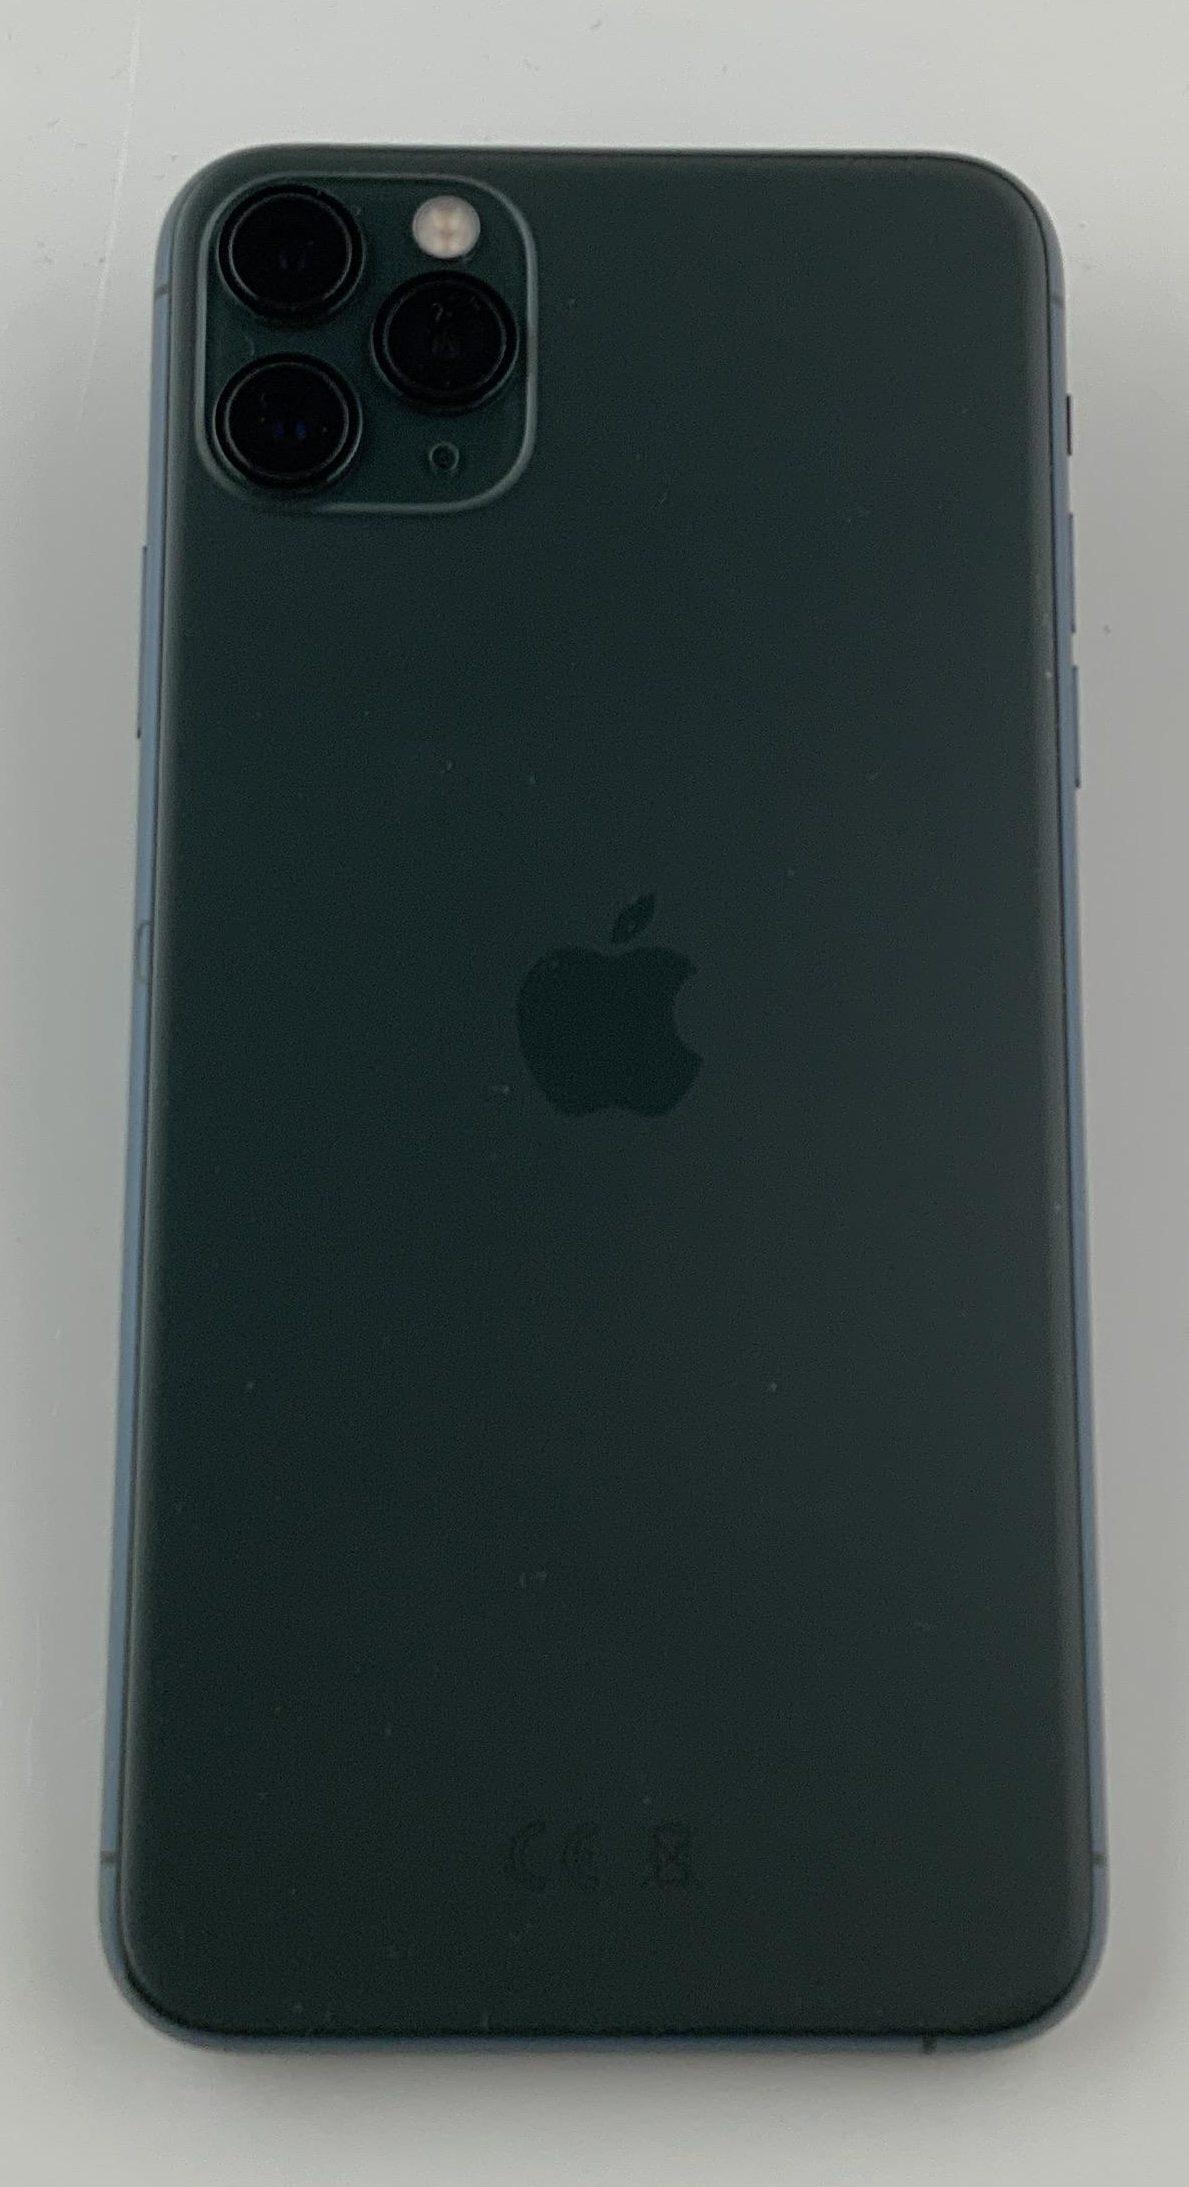 iPhone 11 Pro Max 256GB, 256GB, Midnight Green, image 2